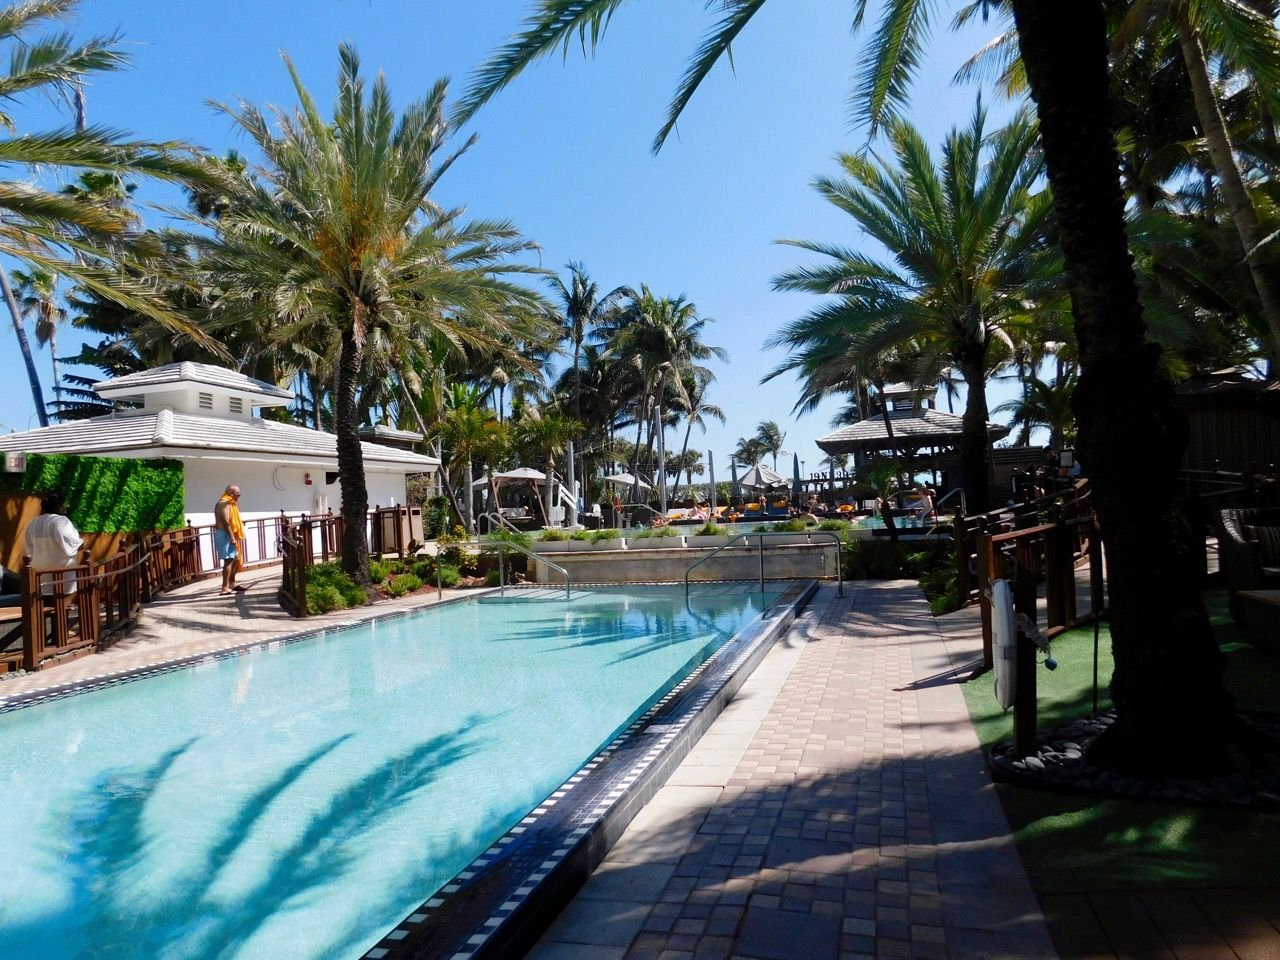 National Hotel, hôtel art déco sur Ocean Drive à South Beach / Miami Beach